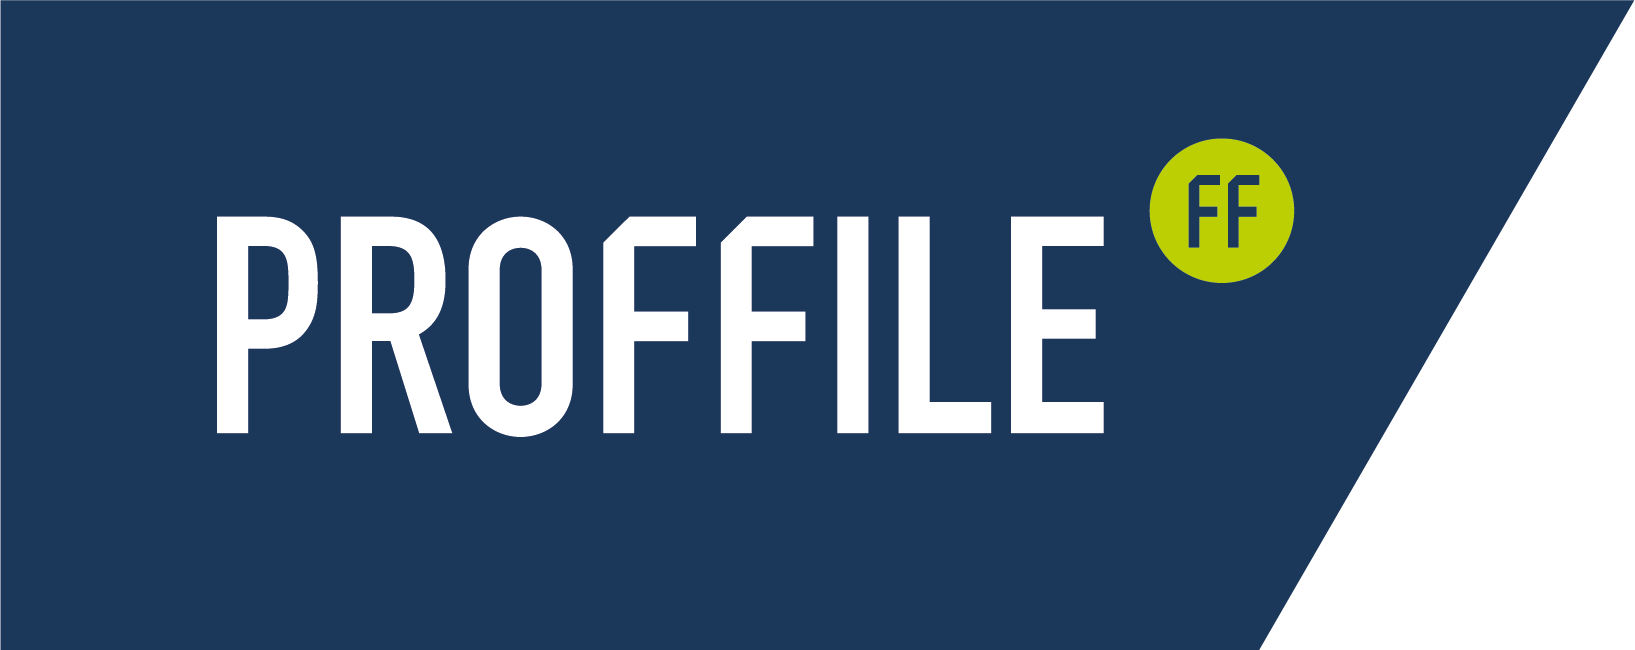 Proffile, Employer Brand Beratung, Recruiting